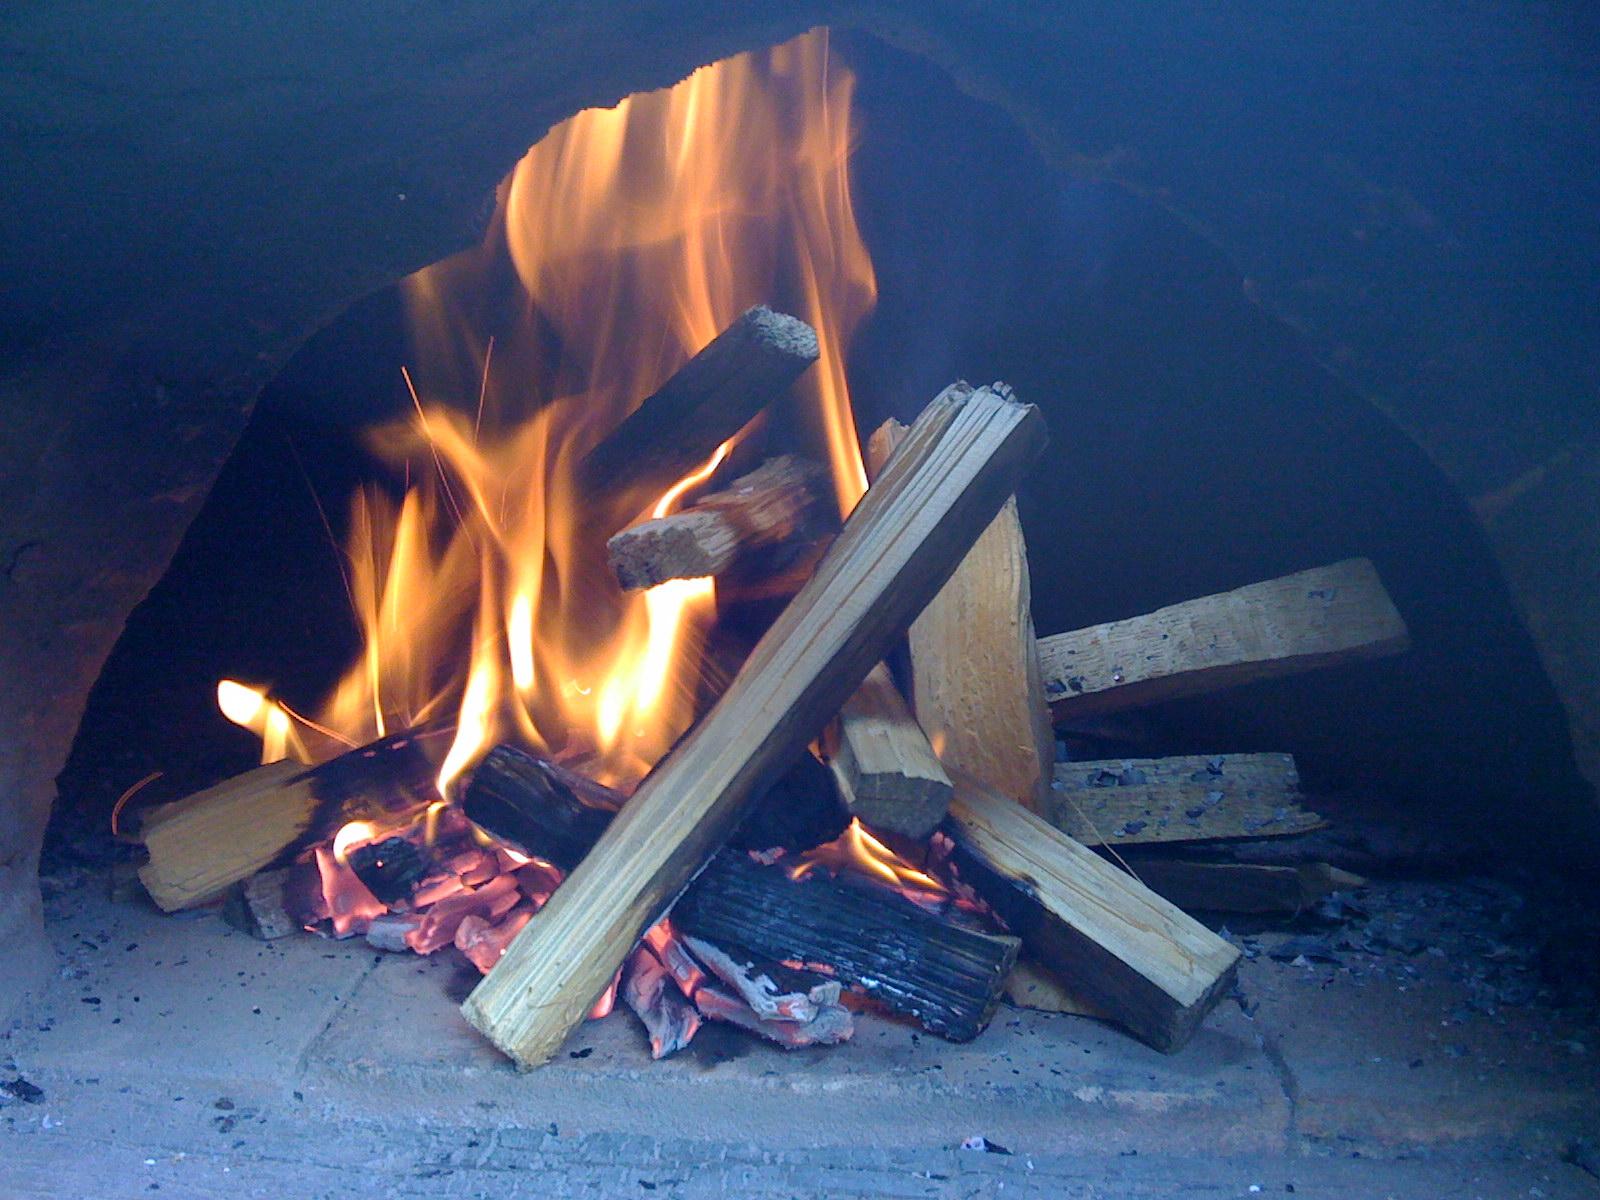 Burning Kindling in the oven entrance